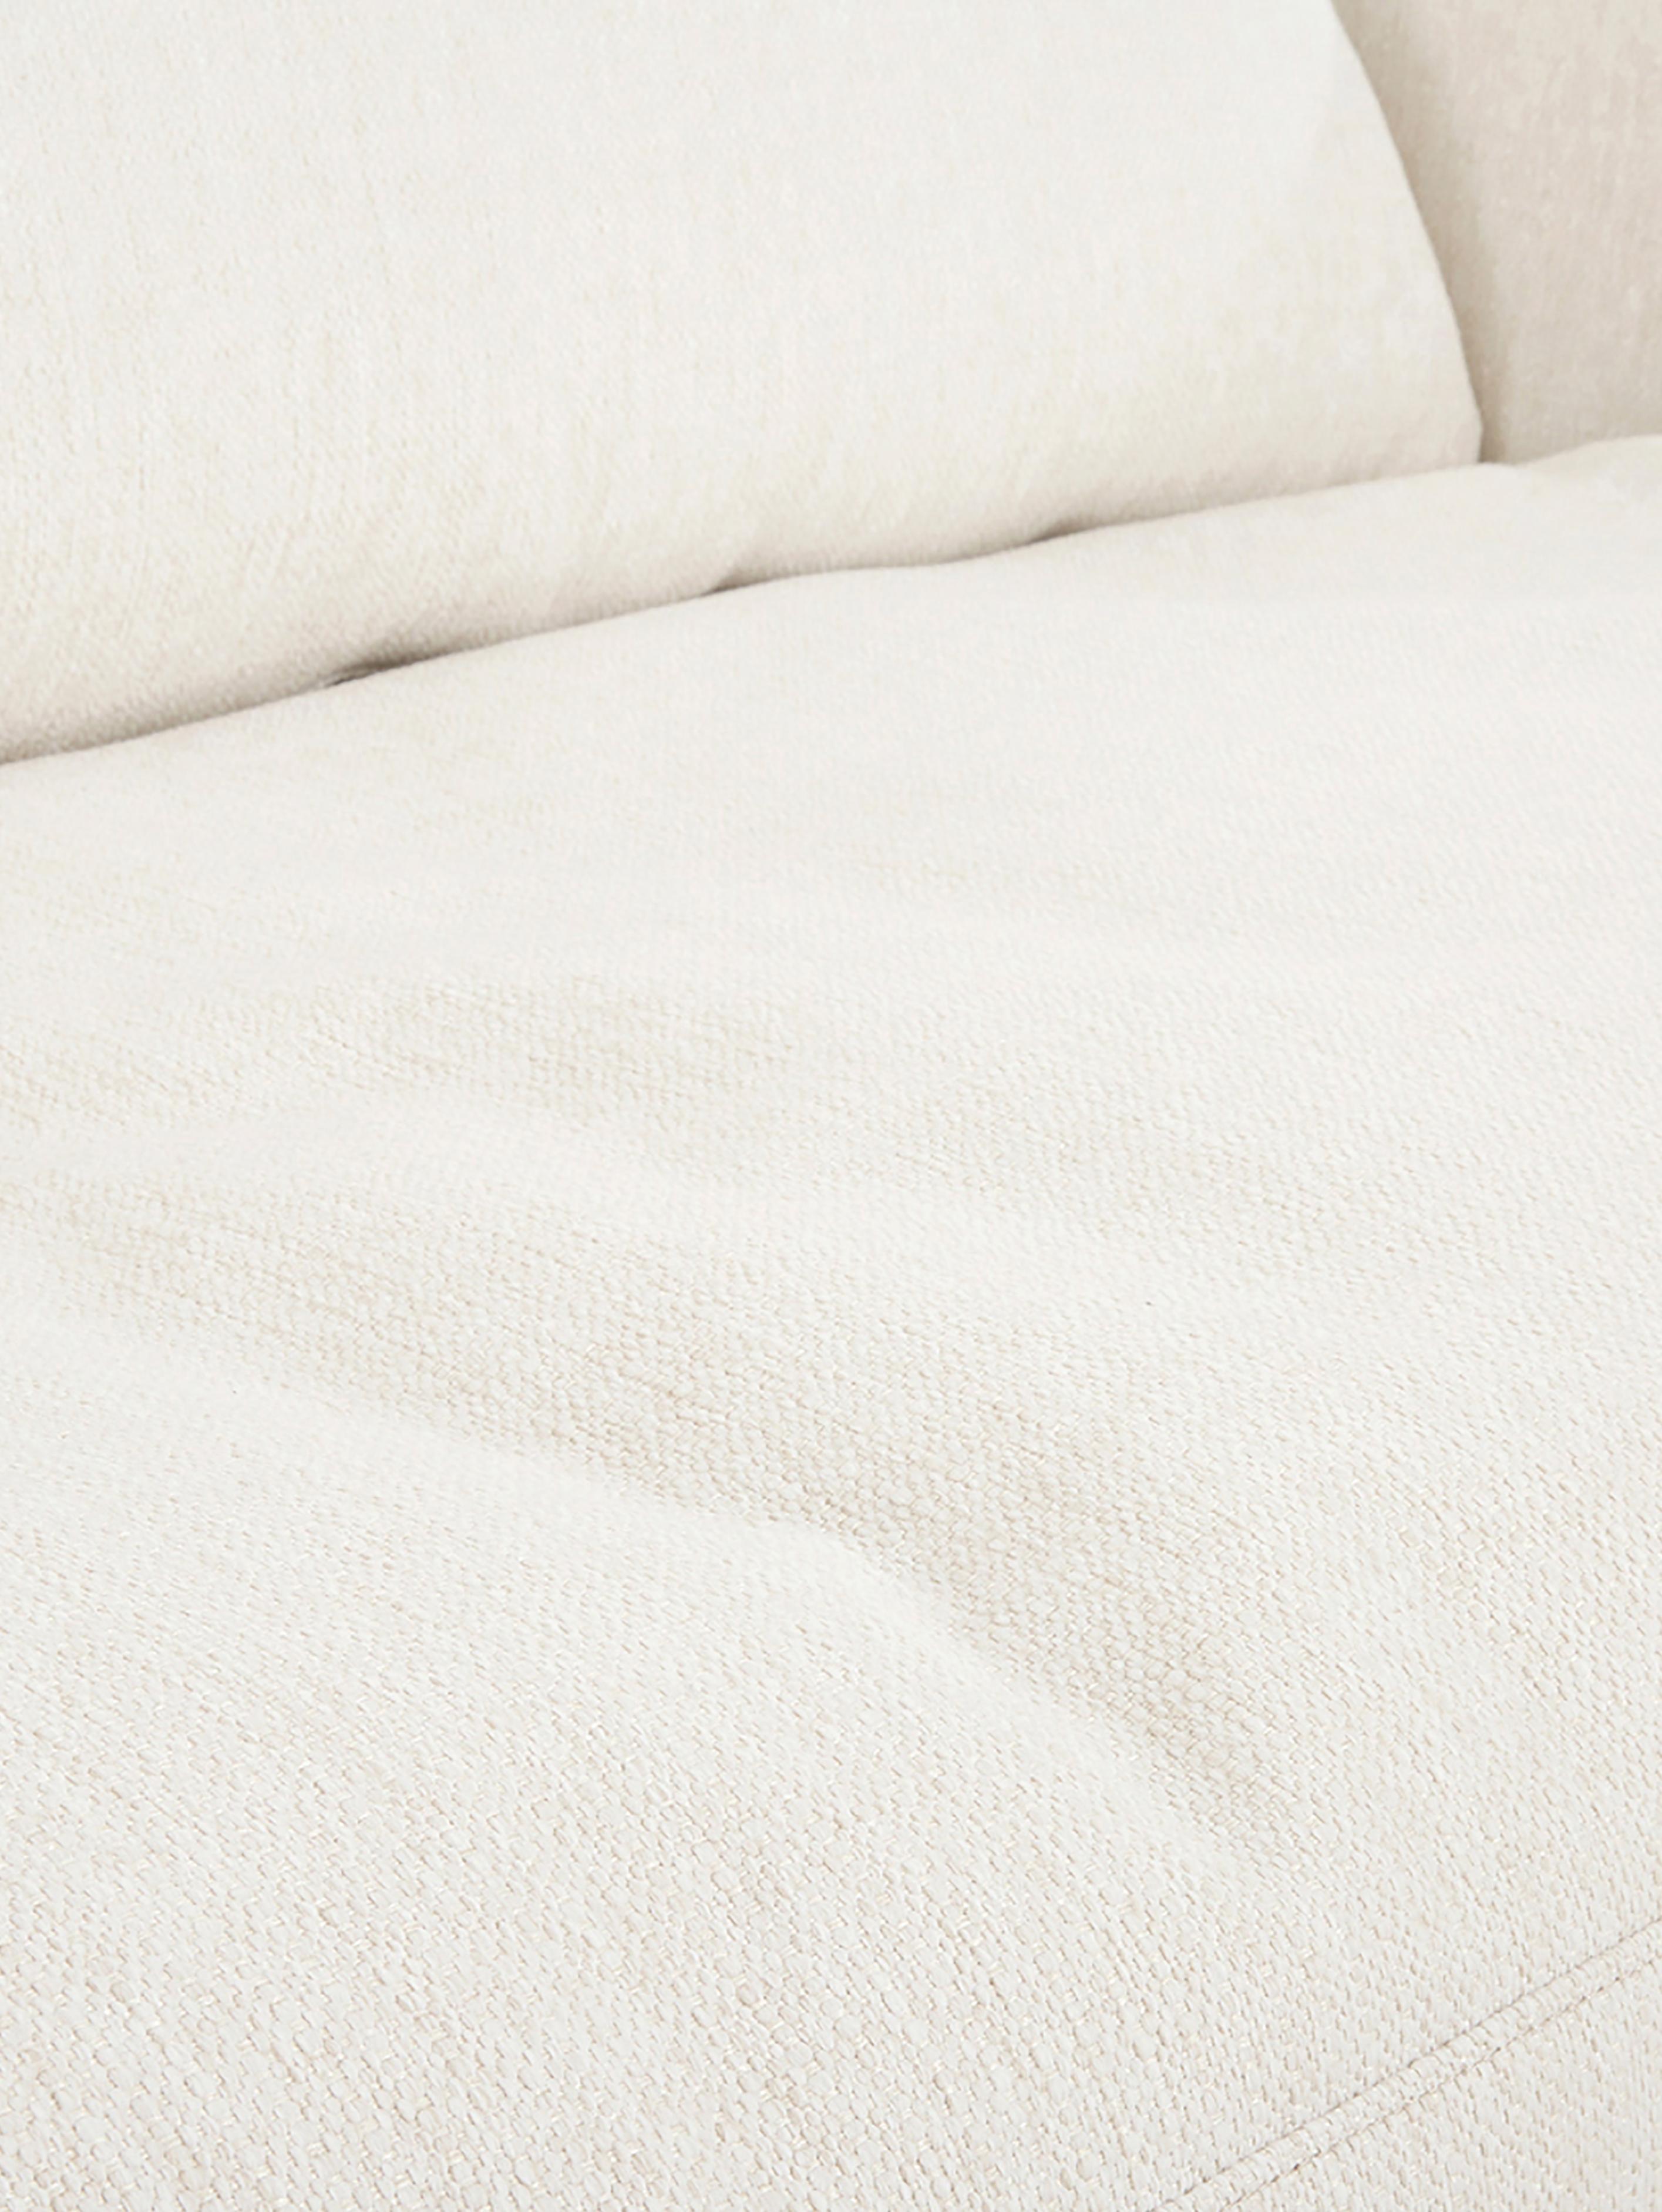 Großes Ecksofa Tribeca, Bezug: Polyester Der hochwertige, Gestell: Massives Kiefernholz, Füße: Massives Buchenholz, lack, Webstoff Beige, B 315 x T 228 cm